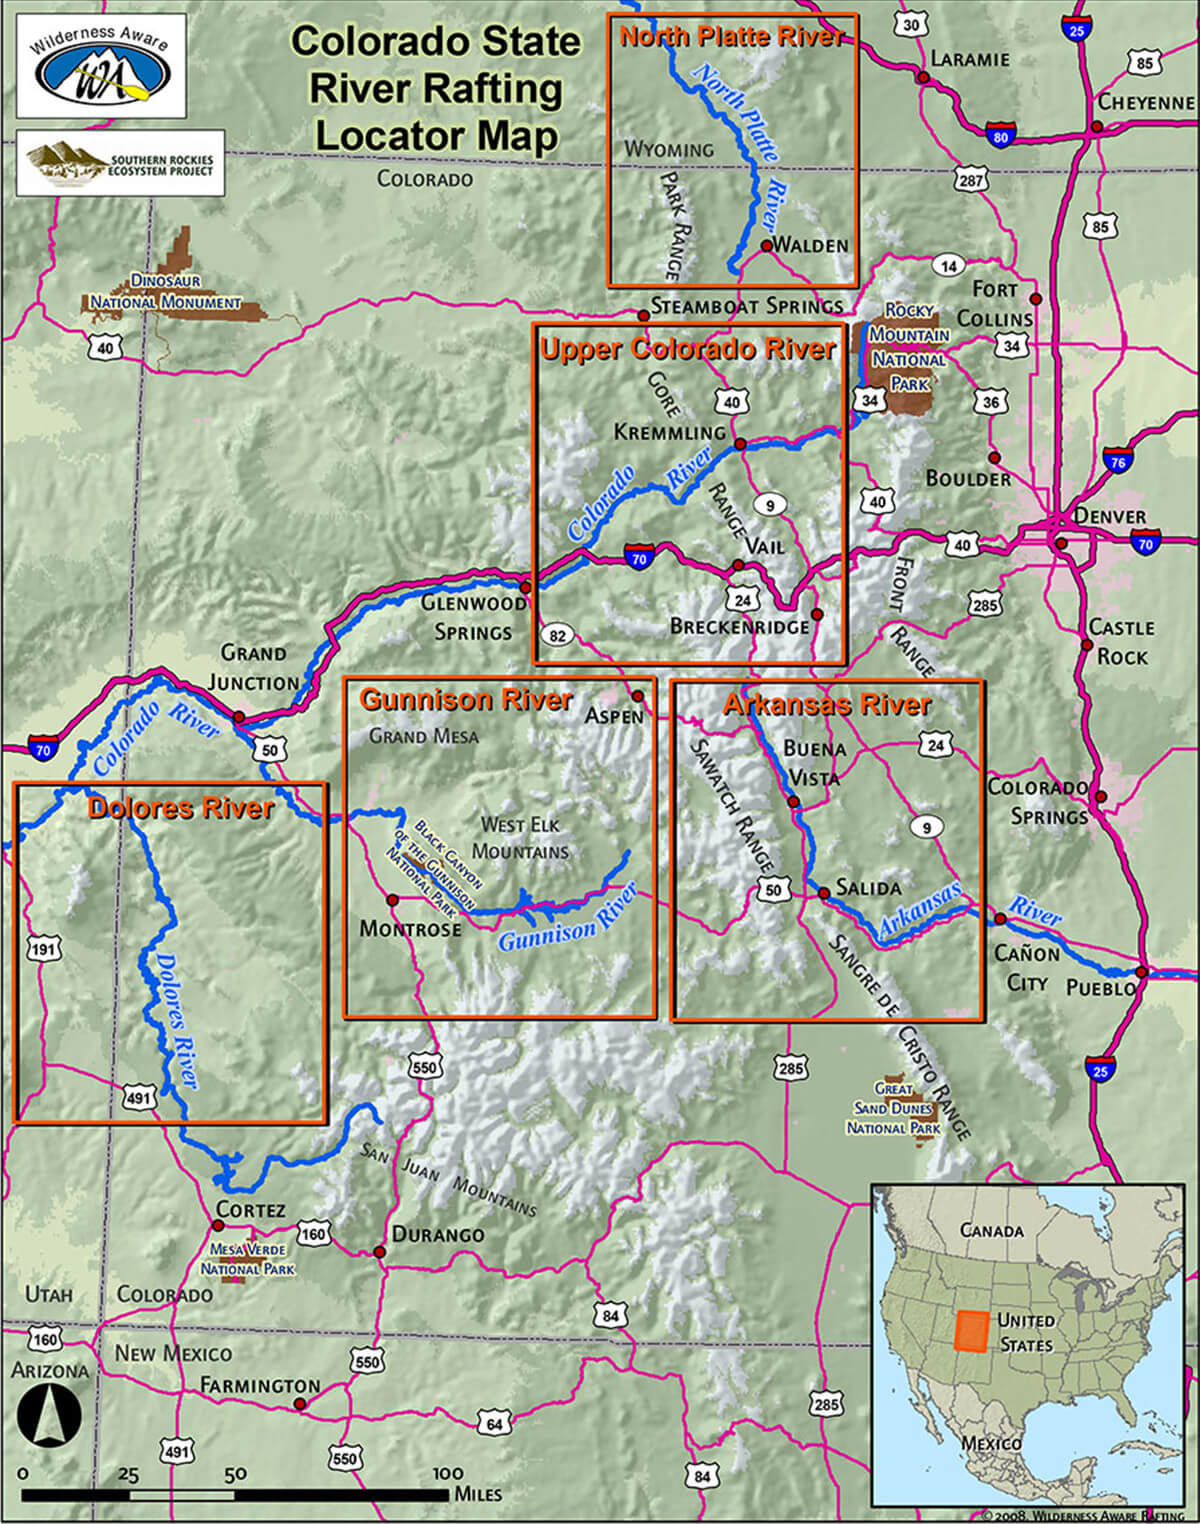 Map Of Colorado River In Arizona.Colorado State River Locator Map Wilderness Aware